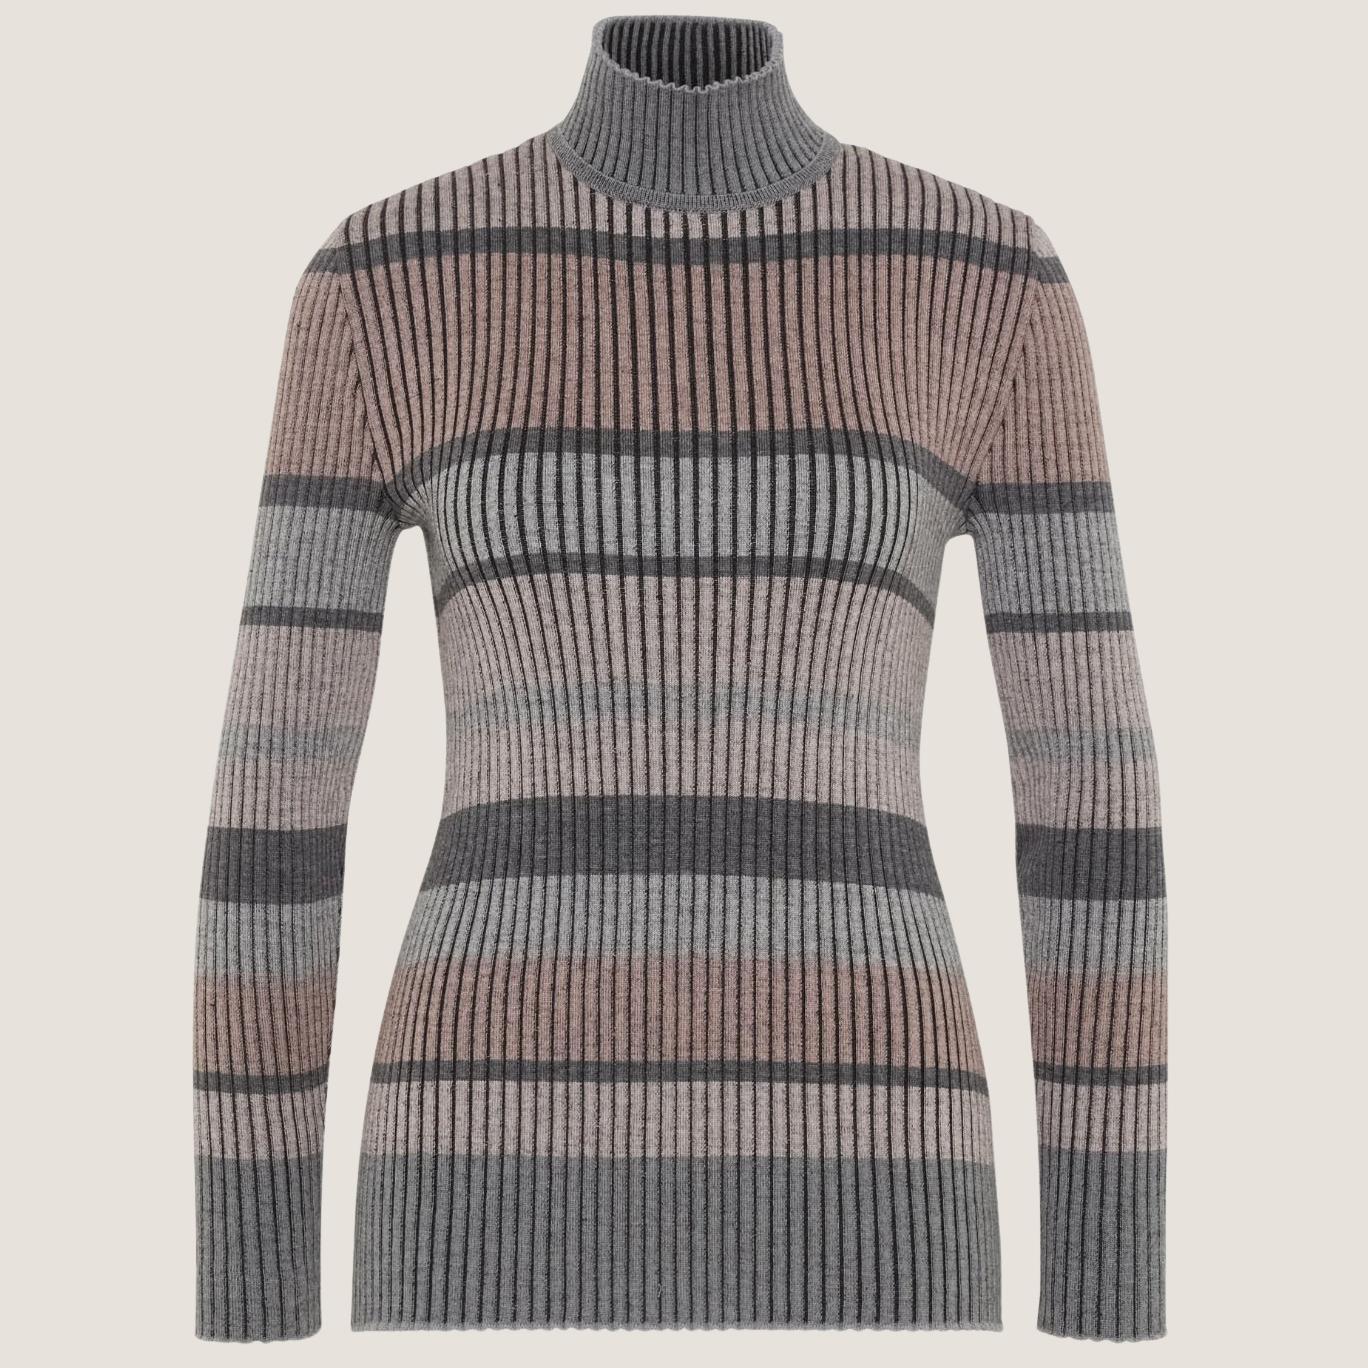 Striped Turtle-Neck Knit